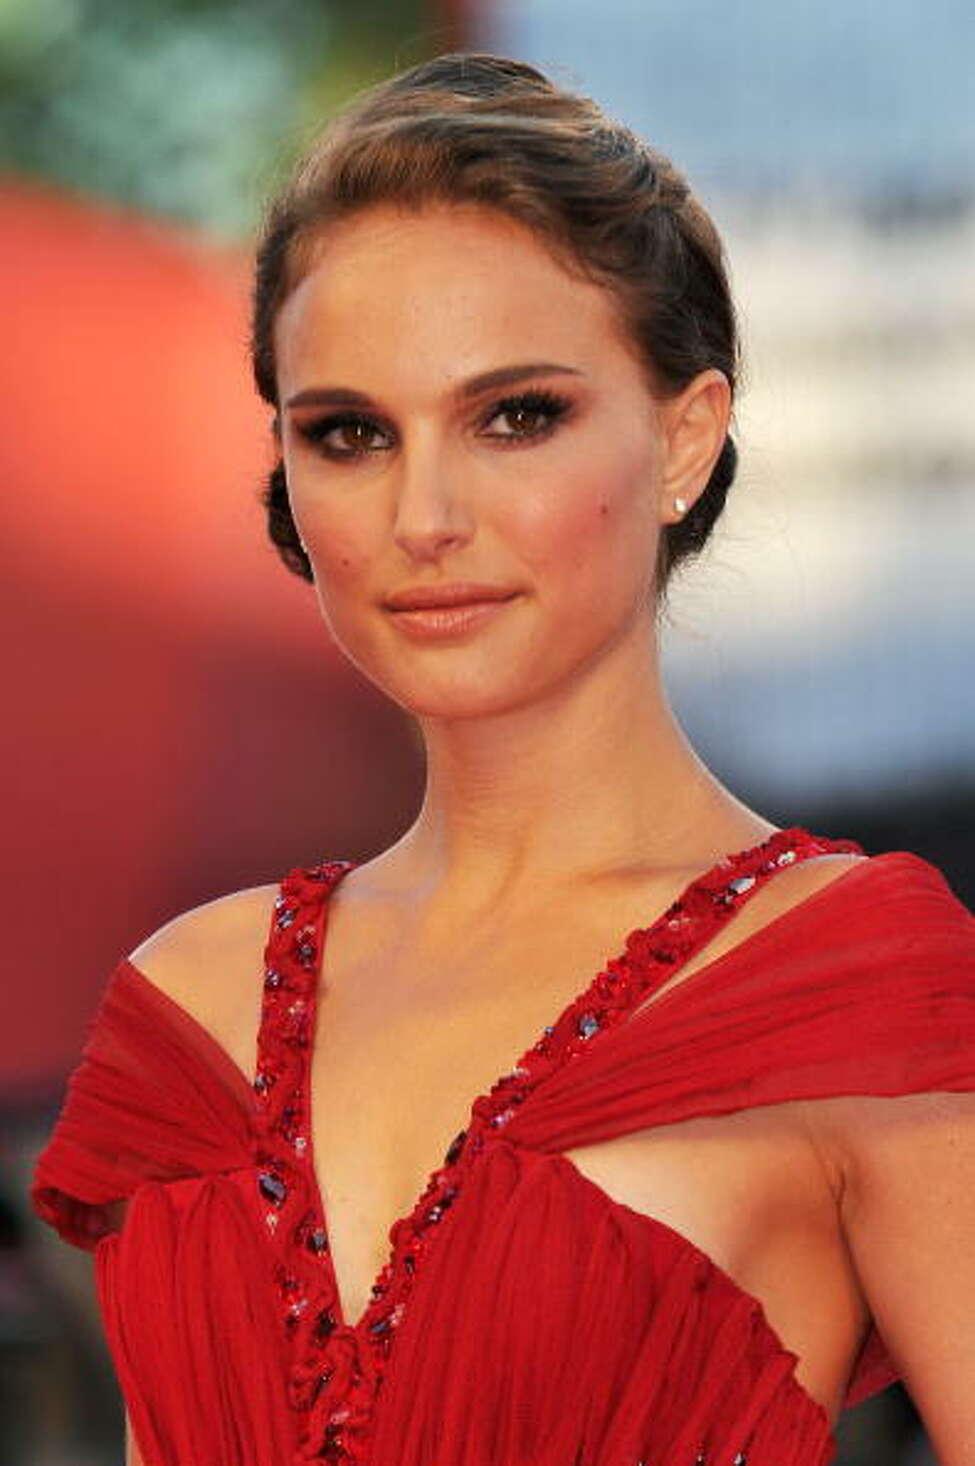 Natalie Portman has been published twice in scientific journals. The